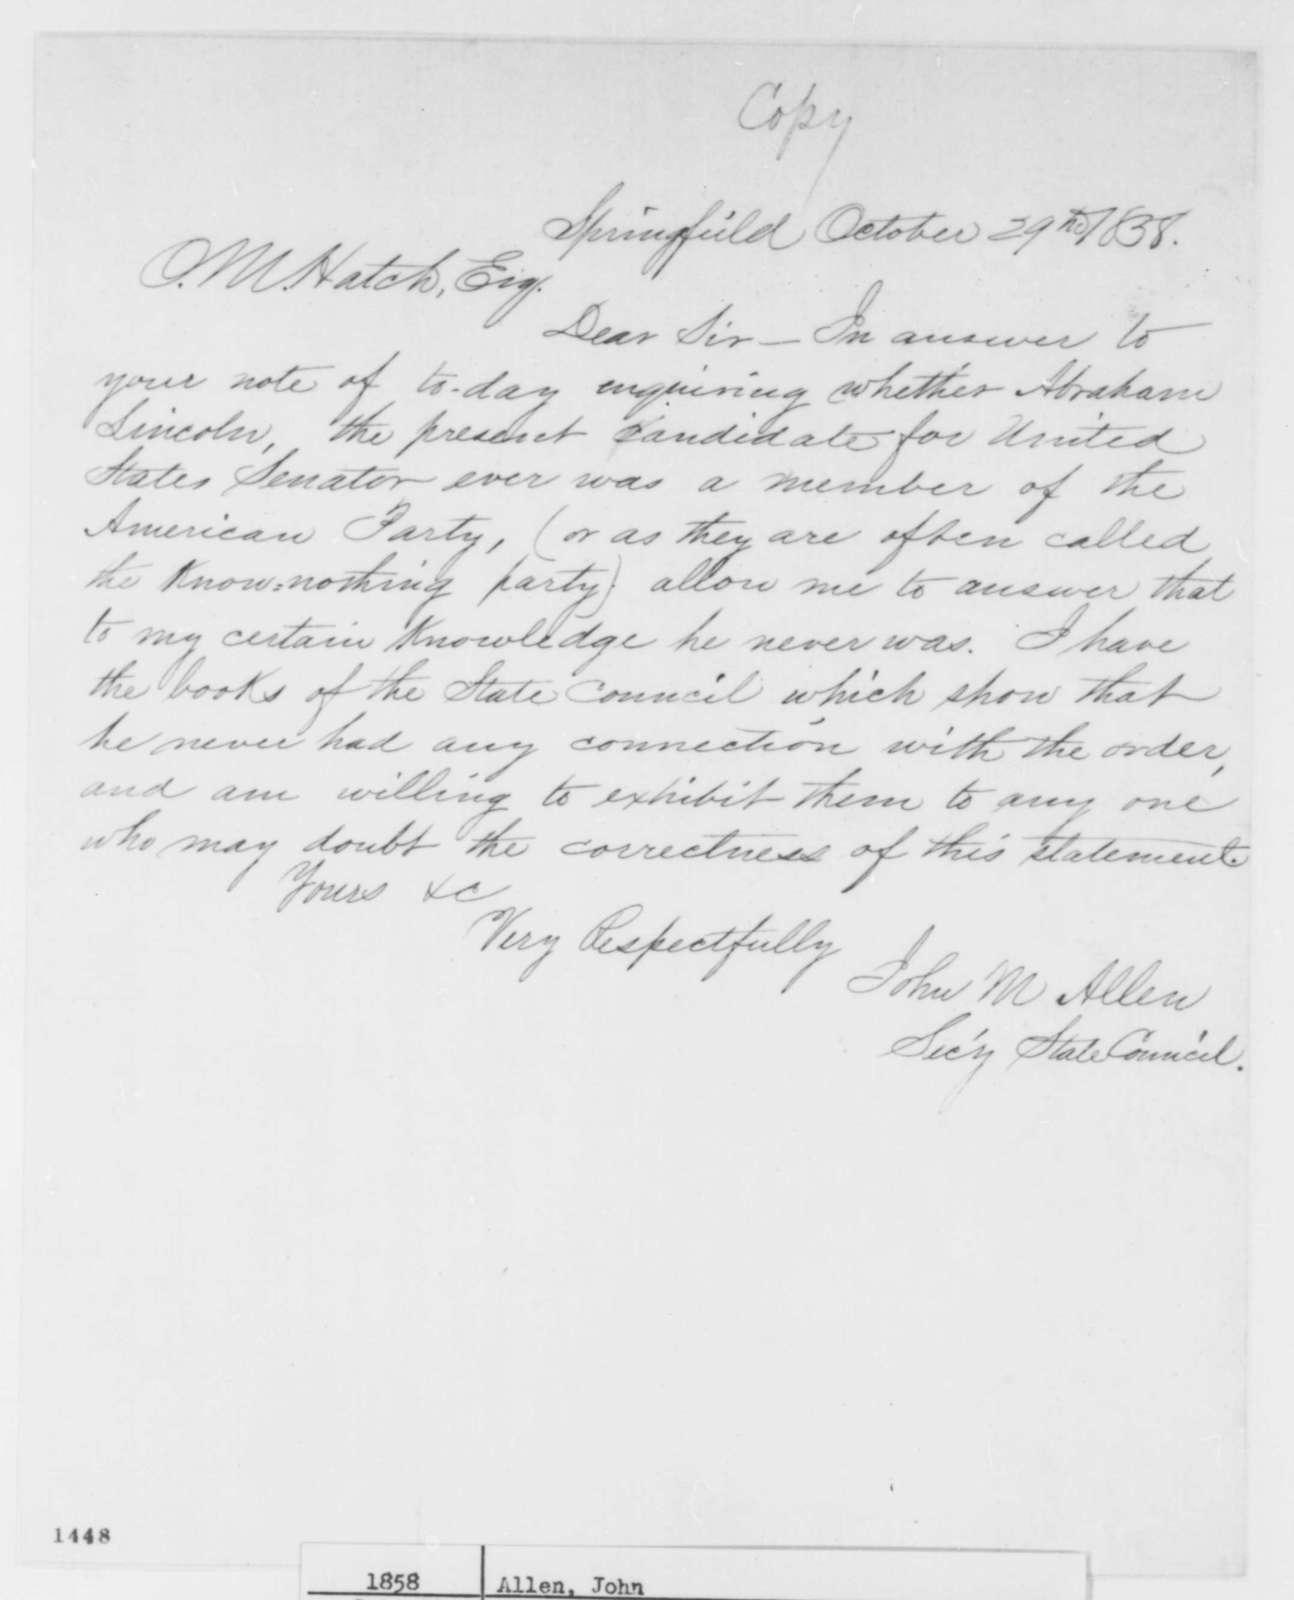 John M. Allen to Ozias M. Hatch, Friday, October 29, 1858  (Senate)